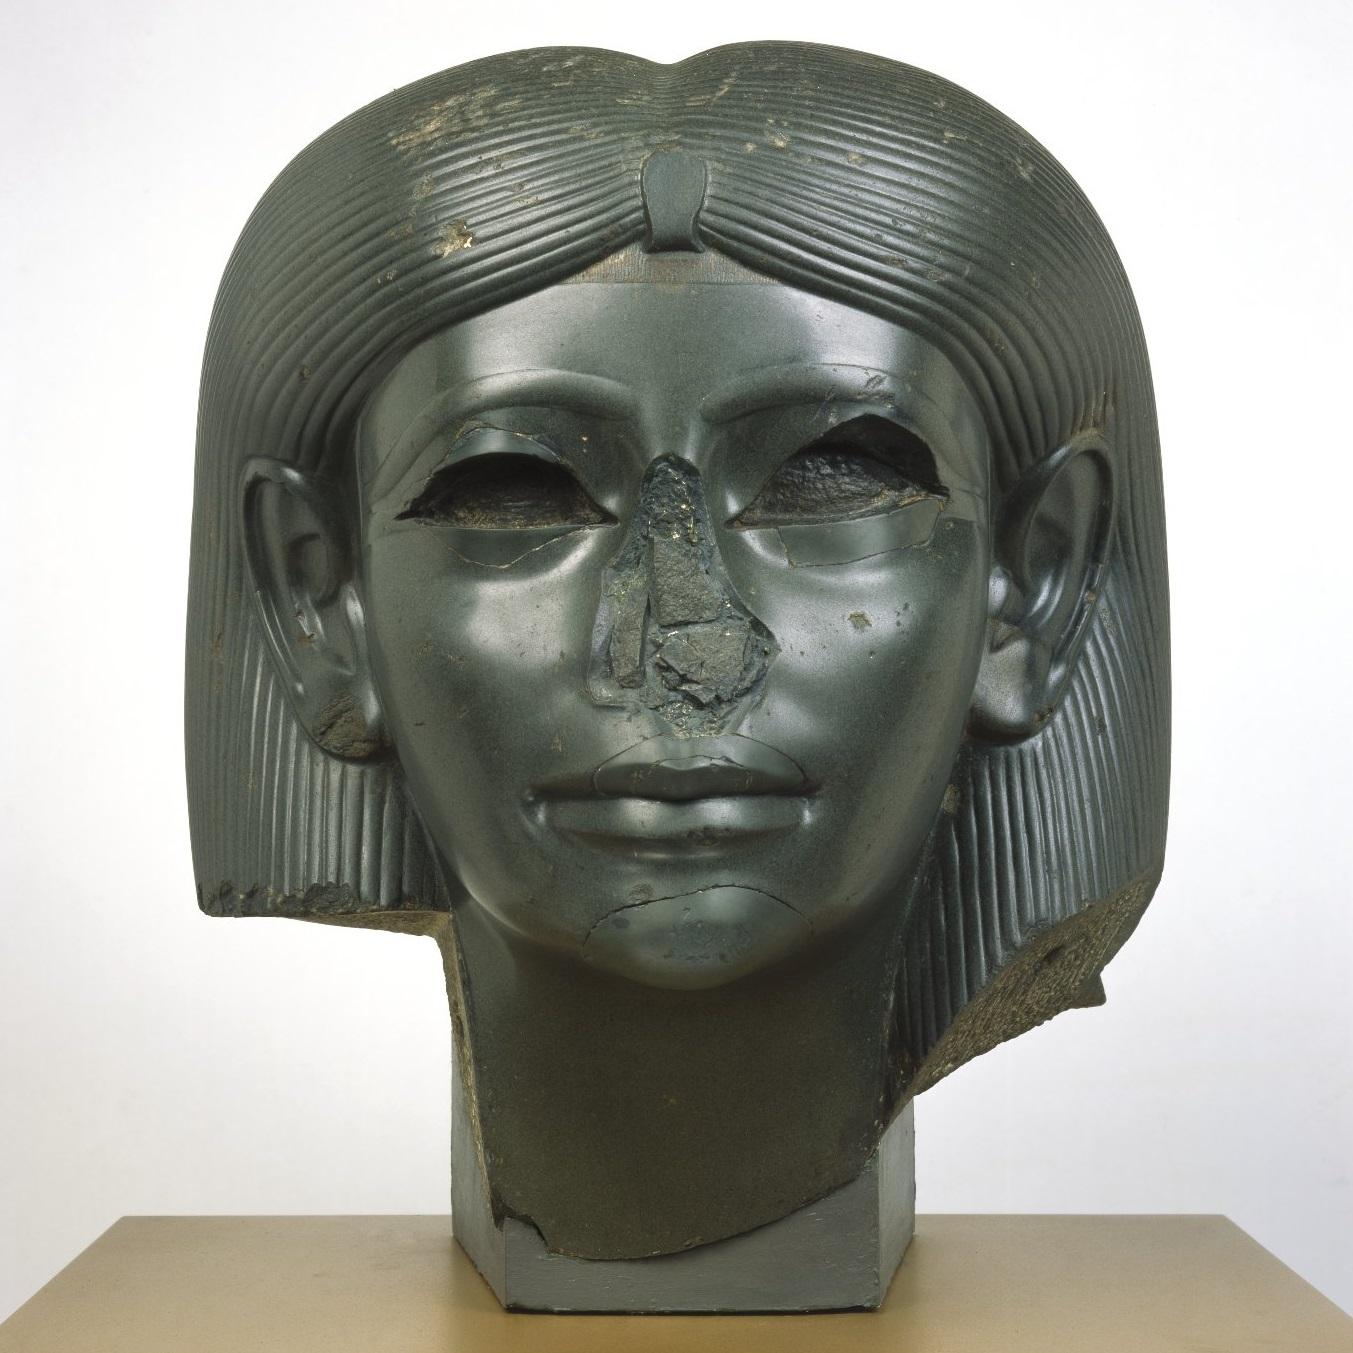 <p><i>Head from a Female Sphinx</i>, circa 1876&ndash;1842 <small>B.C.E.</small> Middle Kingdom, reign of Amenemhat II. Heliopolis, Egypt. Chlorite, 15<sup>5</sup>&frasl;<sub>16</sub> x 13 &times; 13<sup>15</sup>&frasl;<sub>16</sub> in. (38.9 &times; 33.3 &times; 35.4 cm). Brooklyn Museum; Charles Edwin Wilbour Fund, 56.85</p>